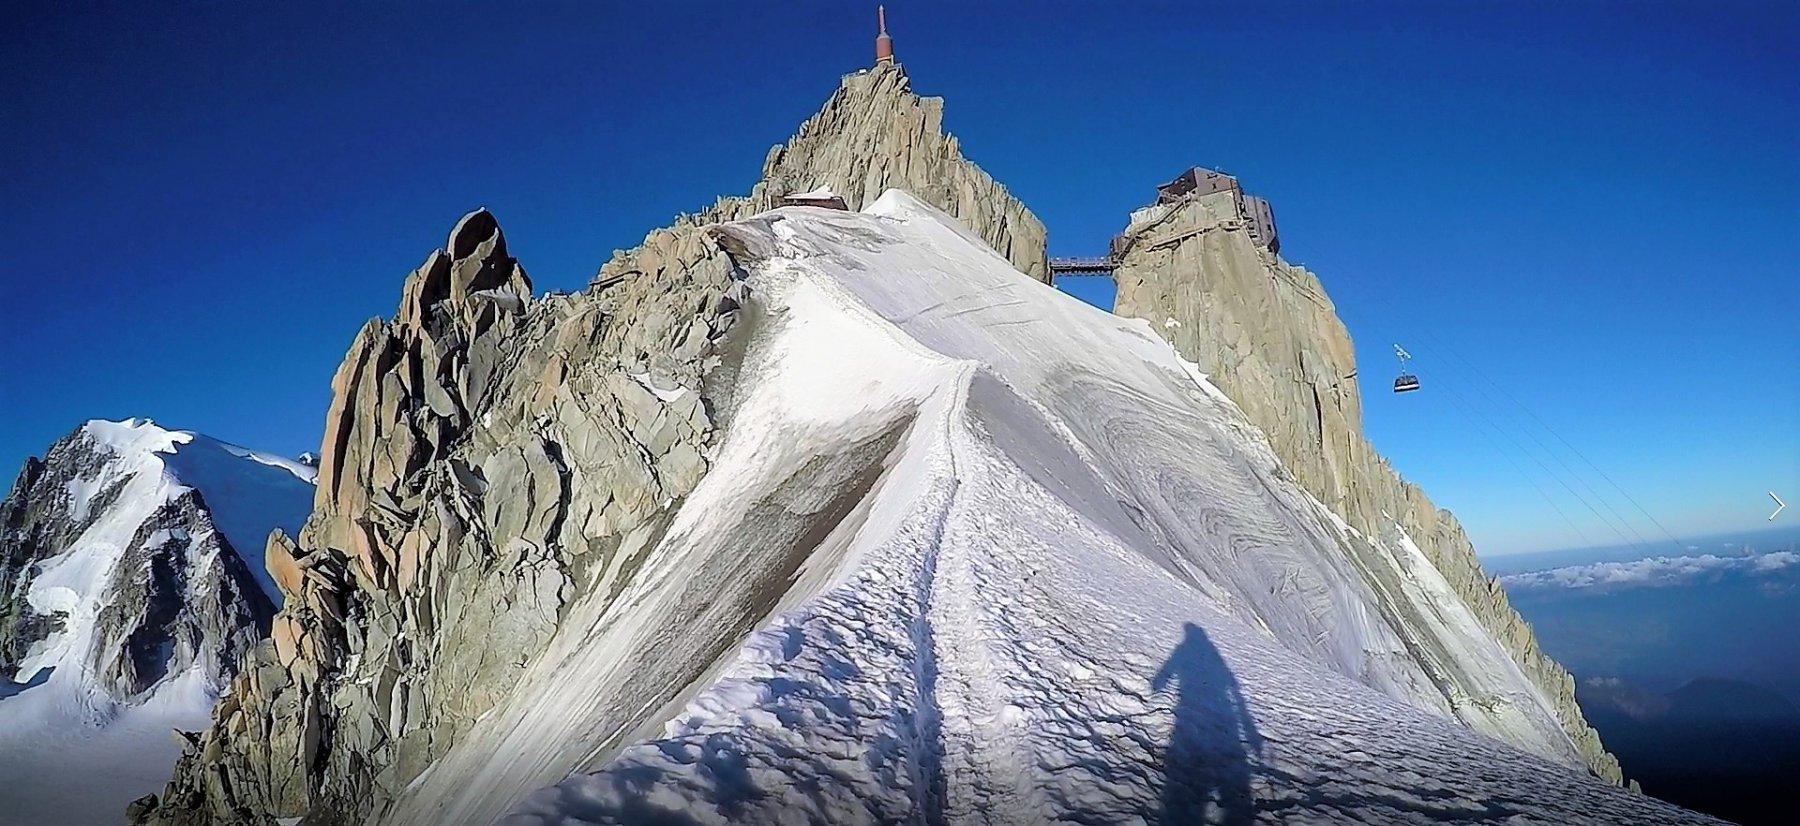 Cresta finale per l'Aiguille du Midi